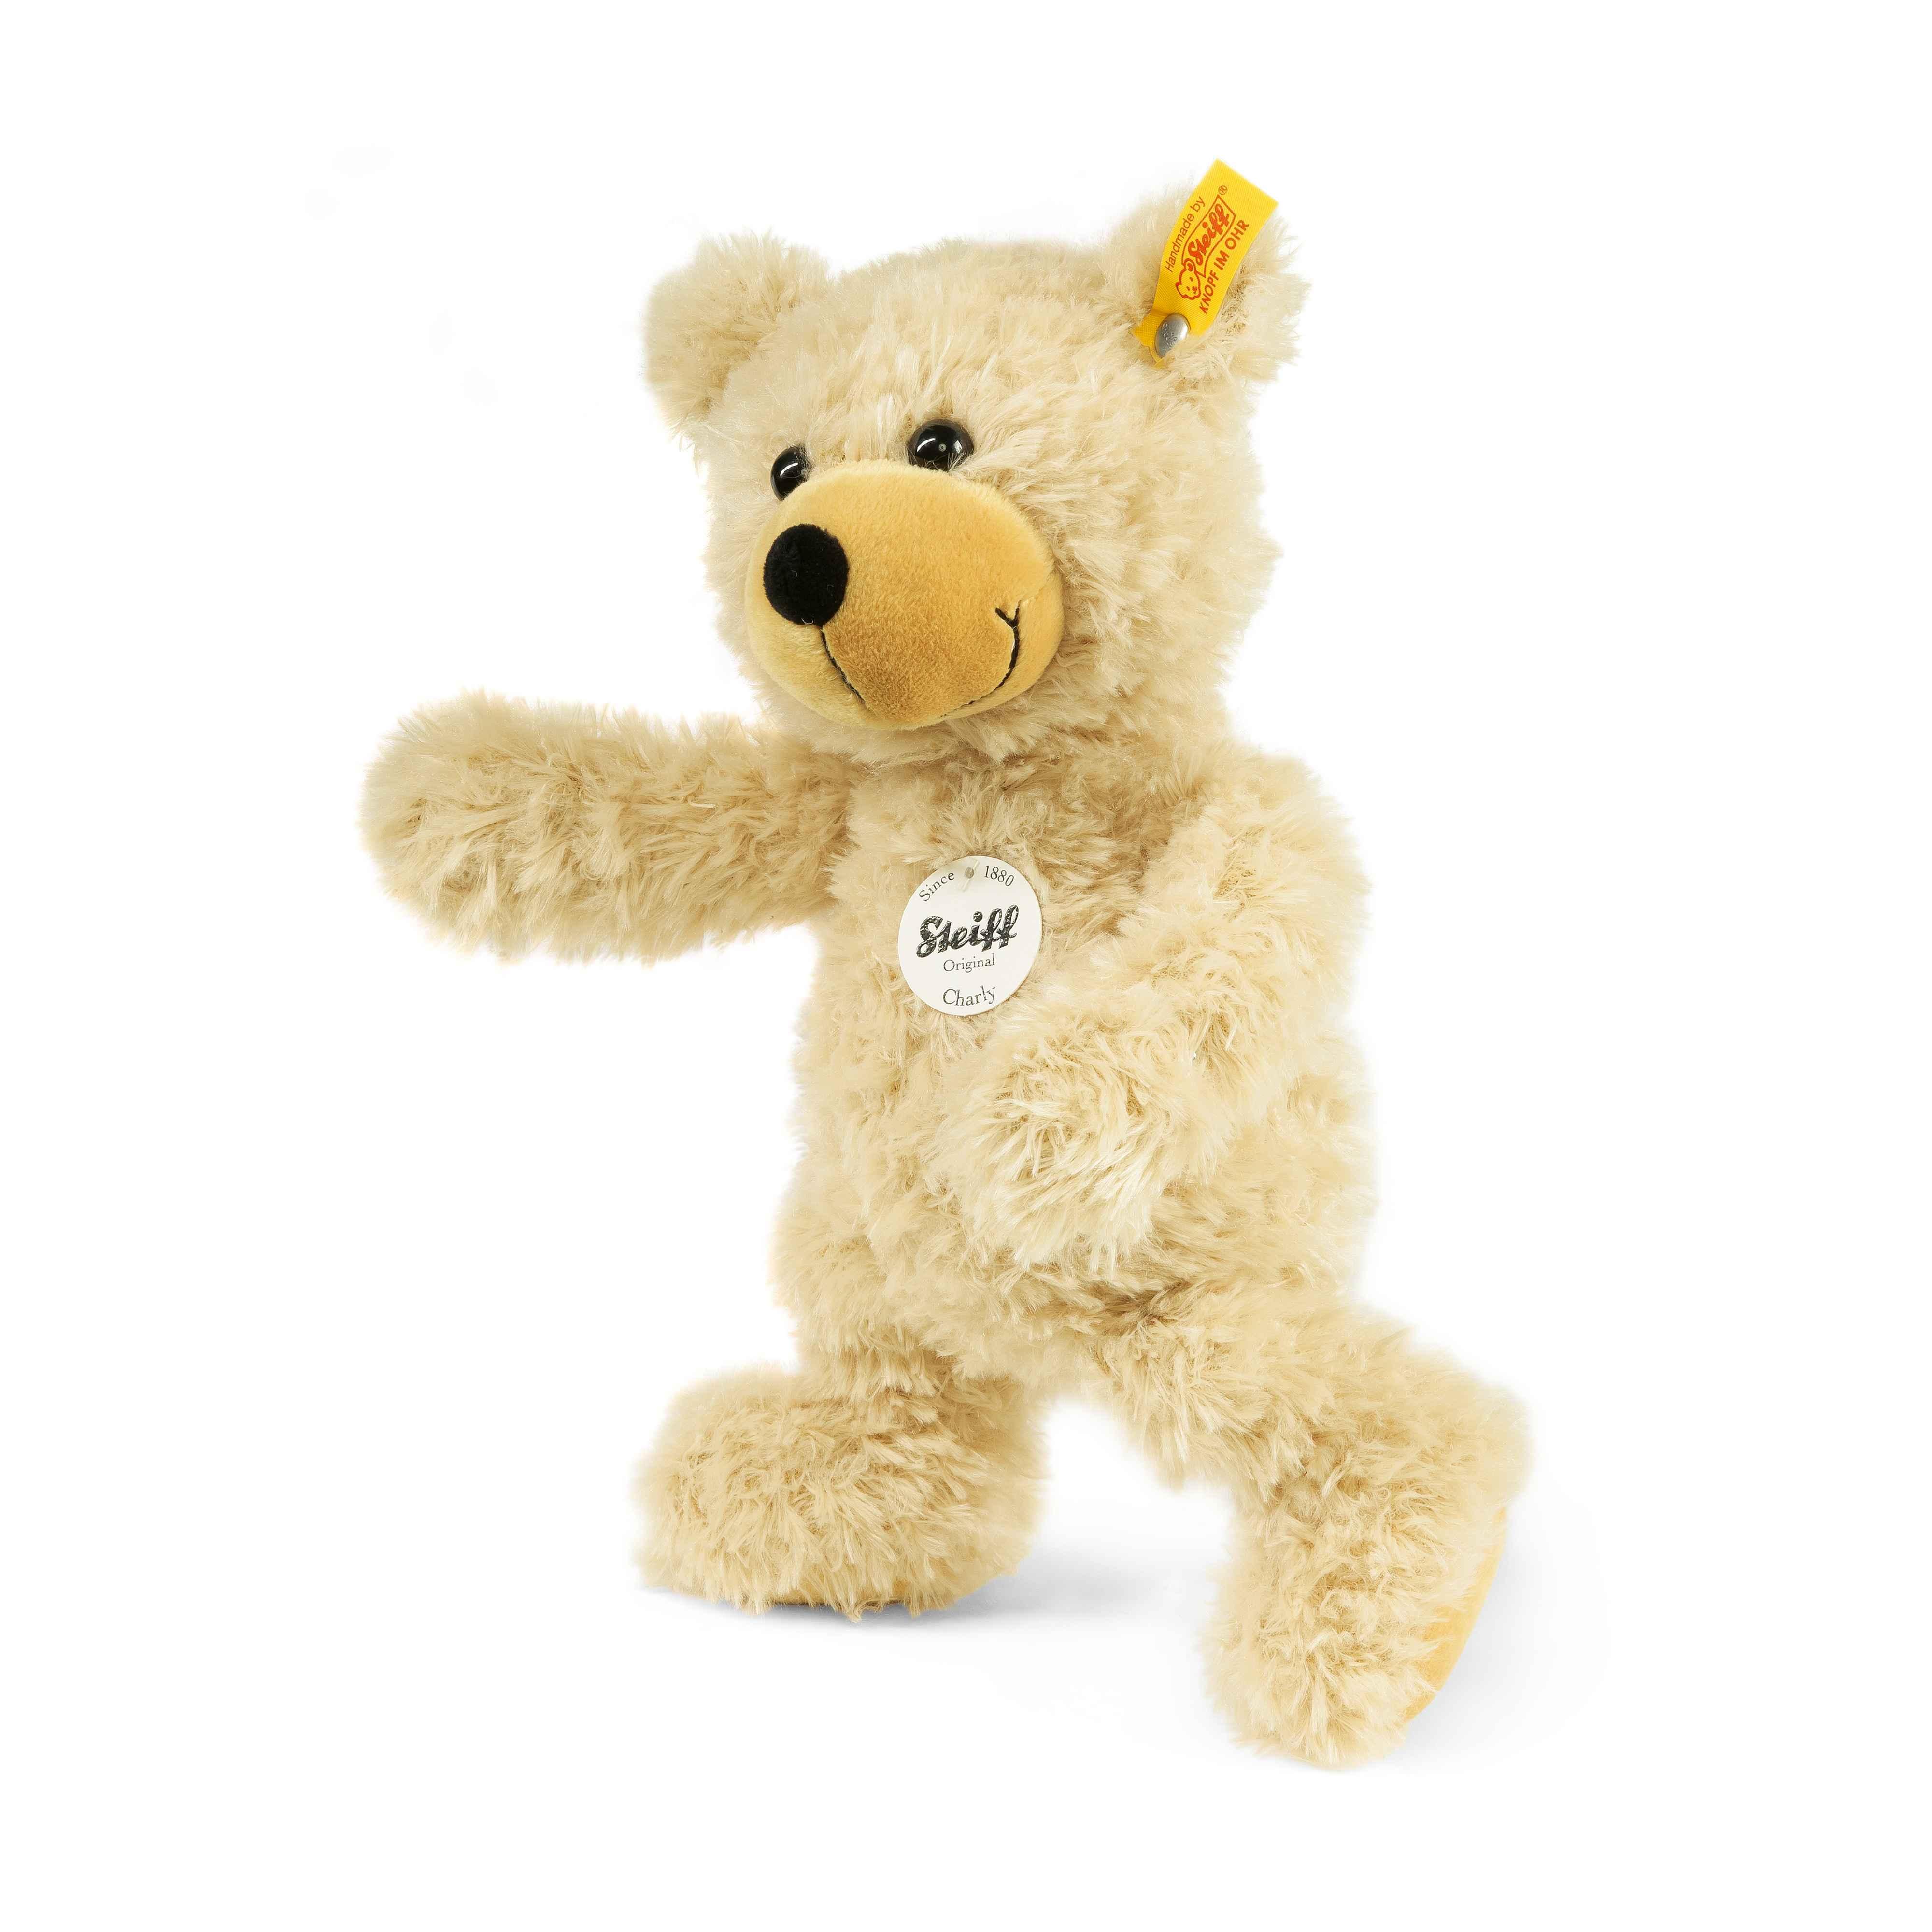 Charly dangling Teddy bear